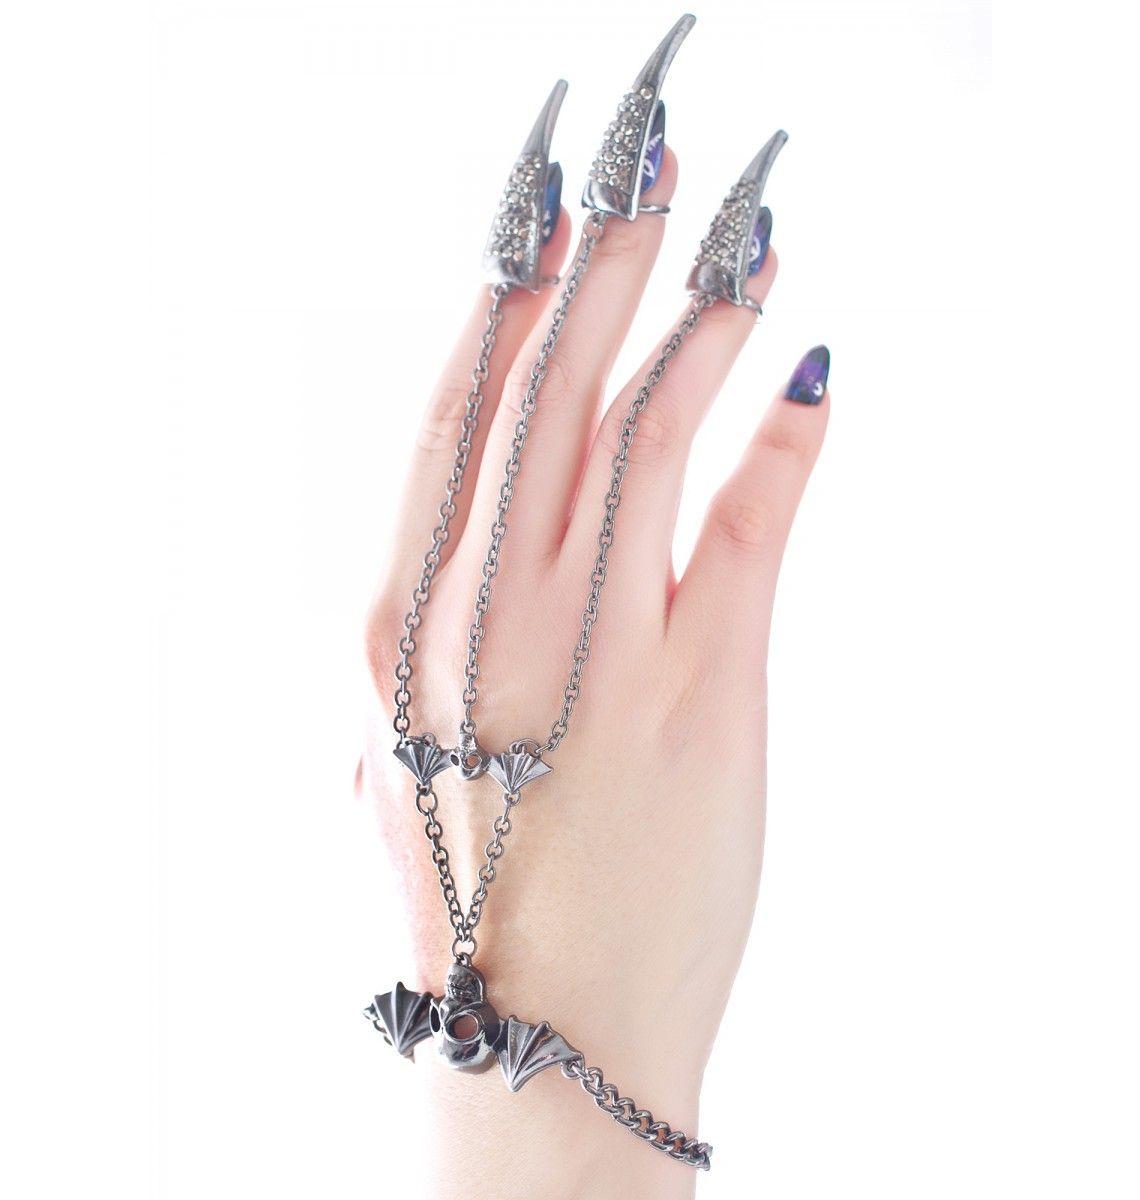 Killa Claws Bracelet | Wraparound, Lobster clasp and Streetwear clothing